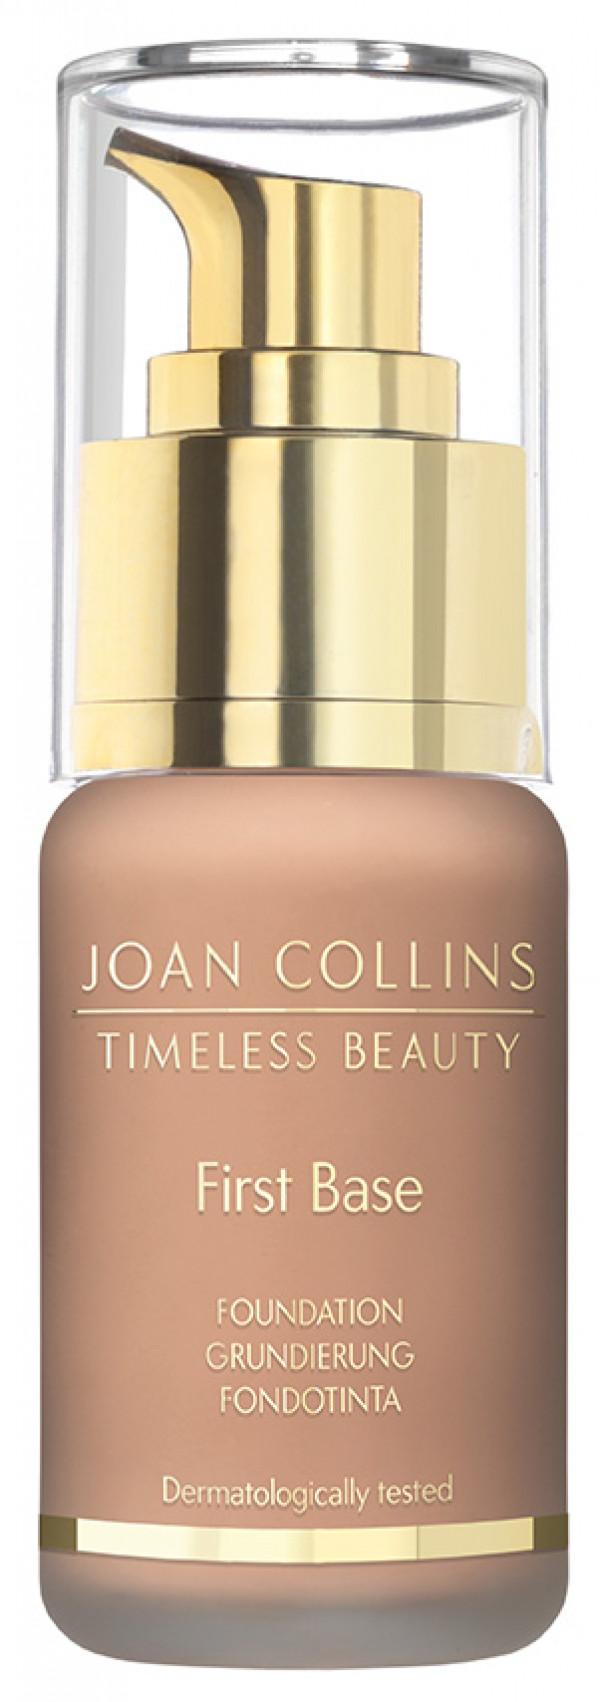 Joan Collins First Base Foundation, cool dark